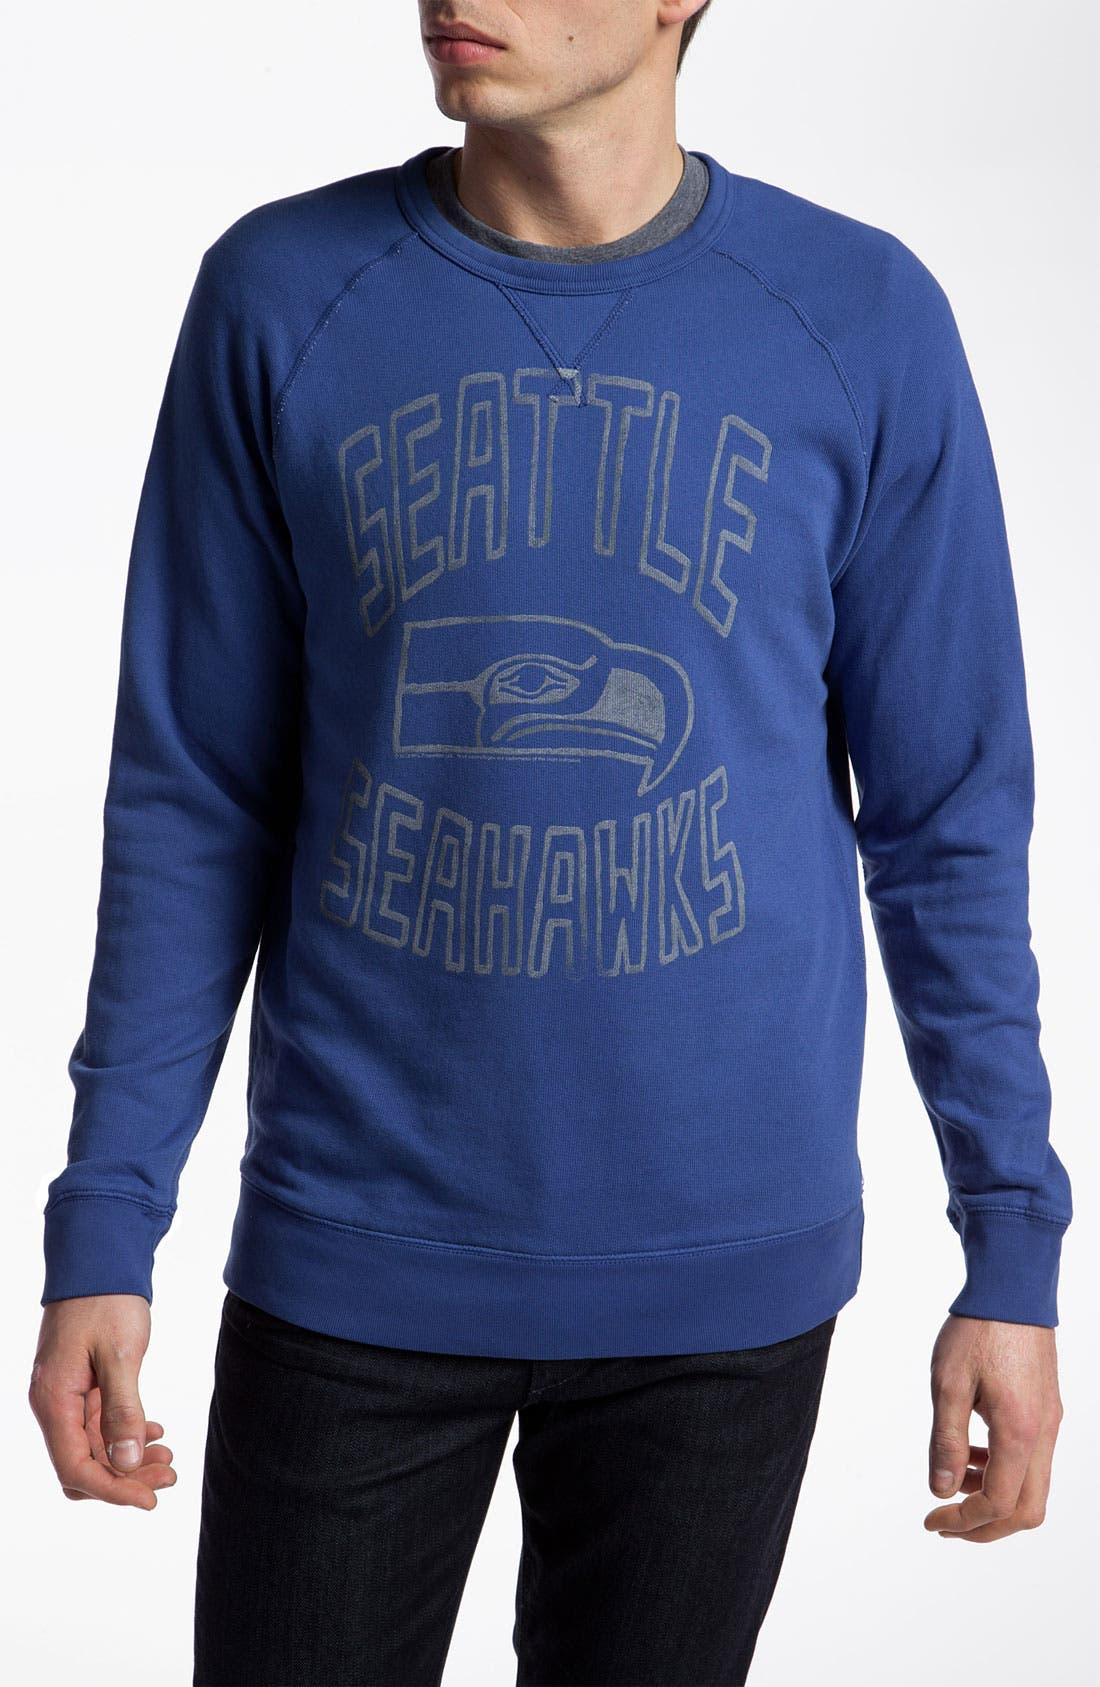 Main Image - Junk Food 'Seattle Seahawks' Sweatshirt